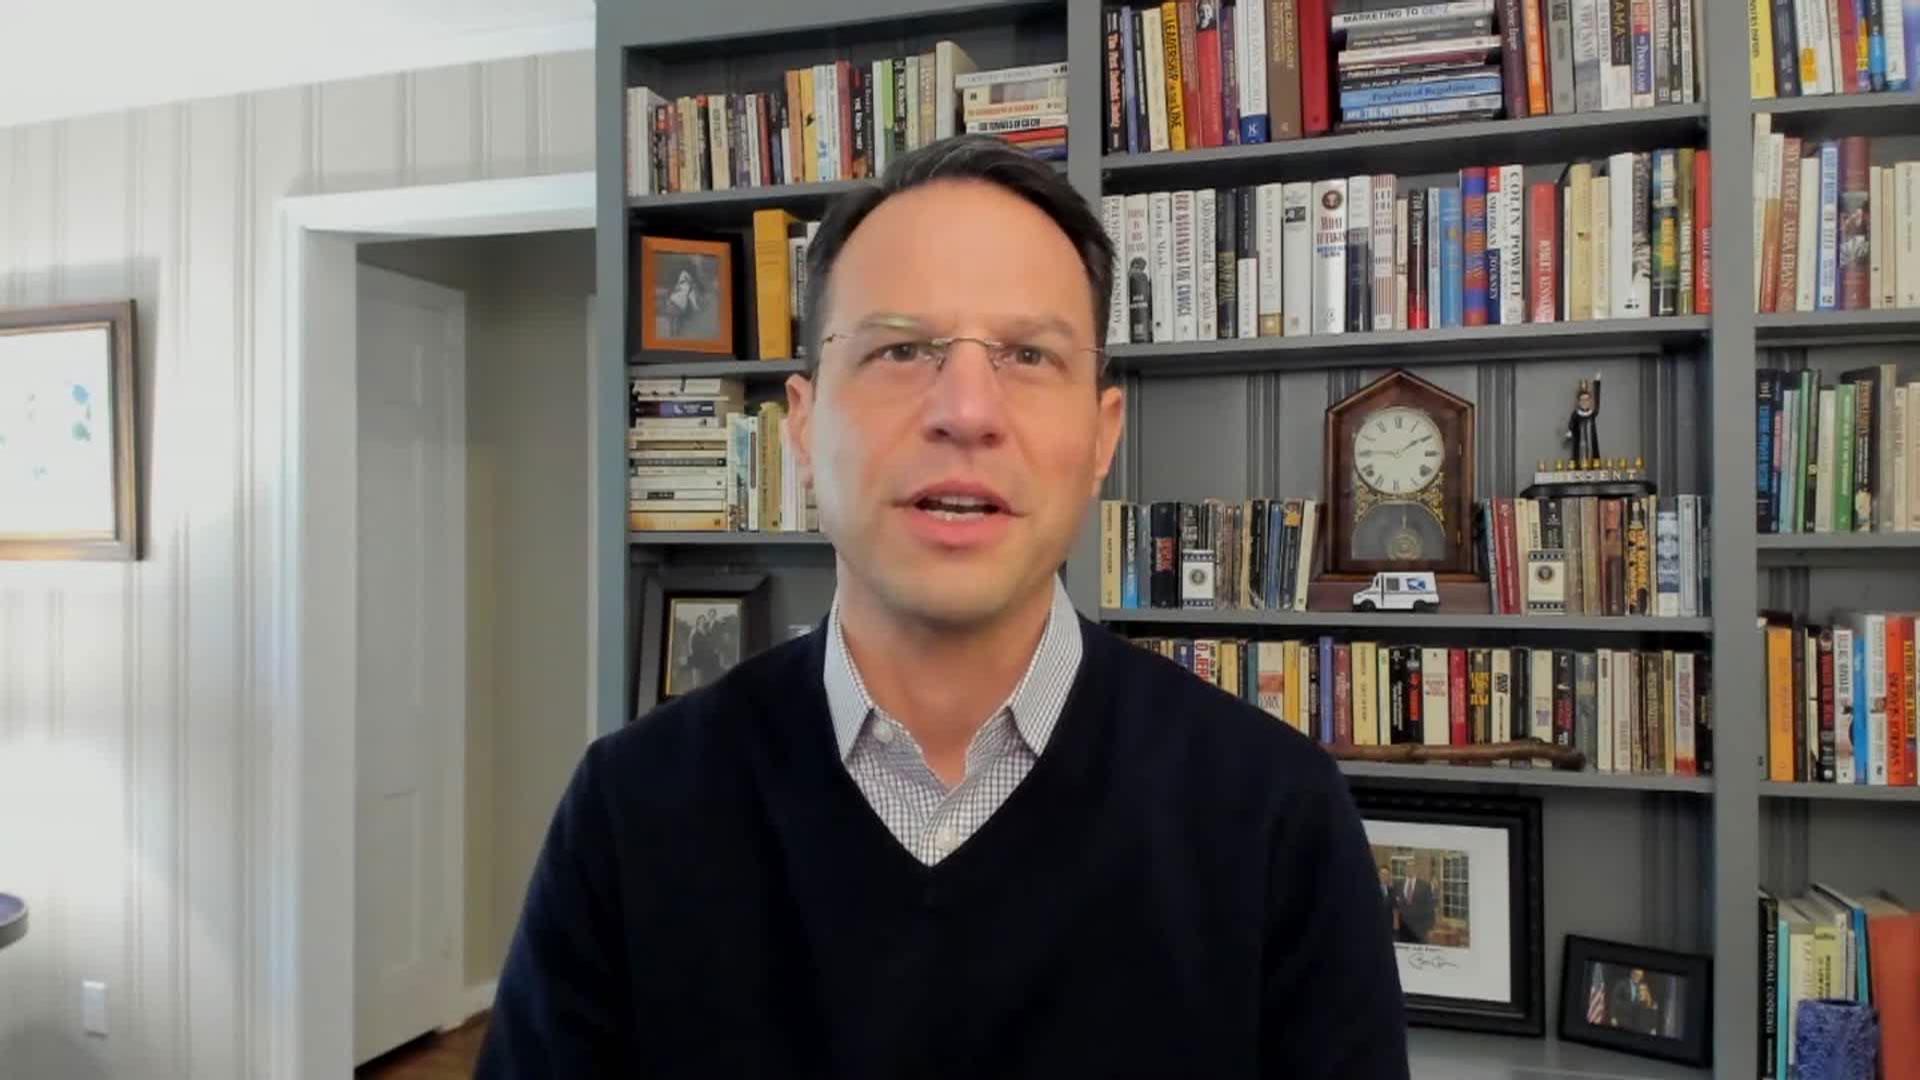 Pennsylvania attorney general Josh Shapiro speaks with CNN on Friday, November 6.